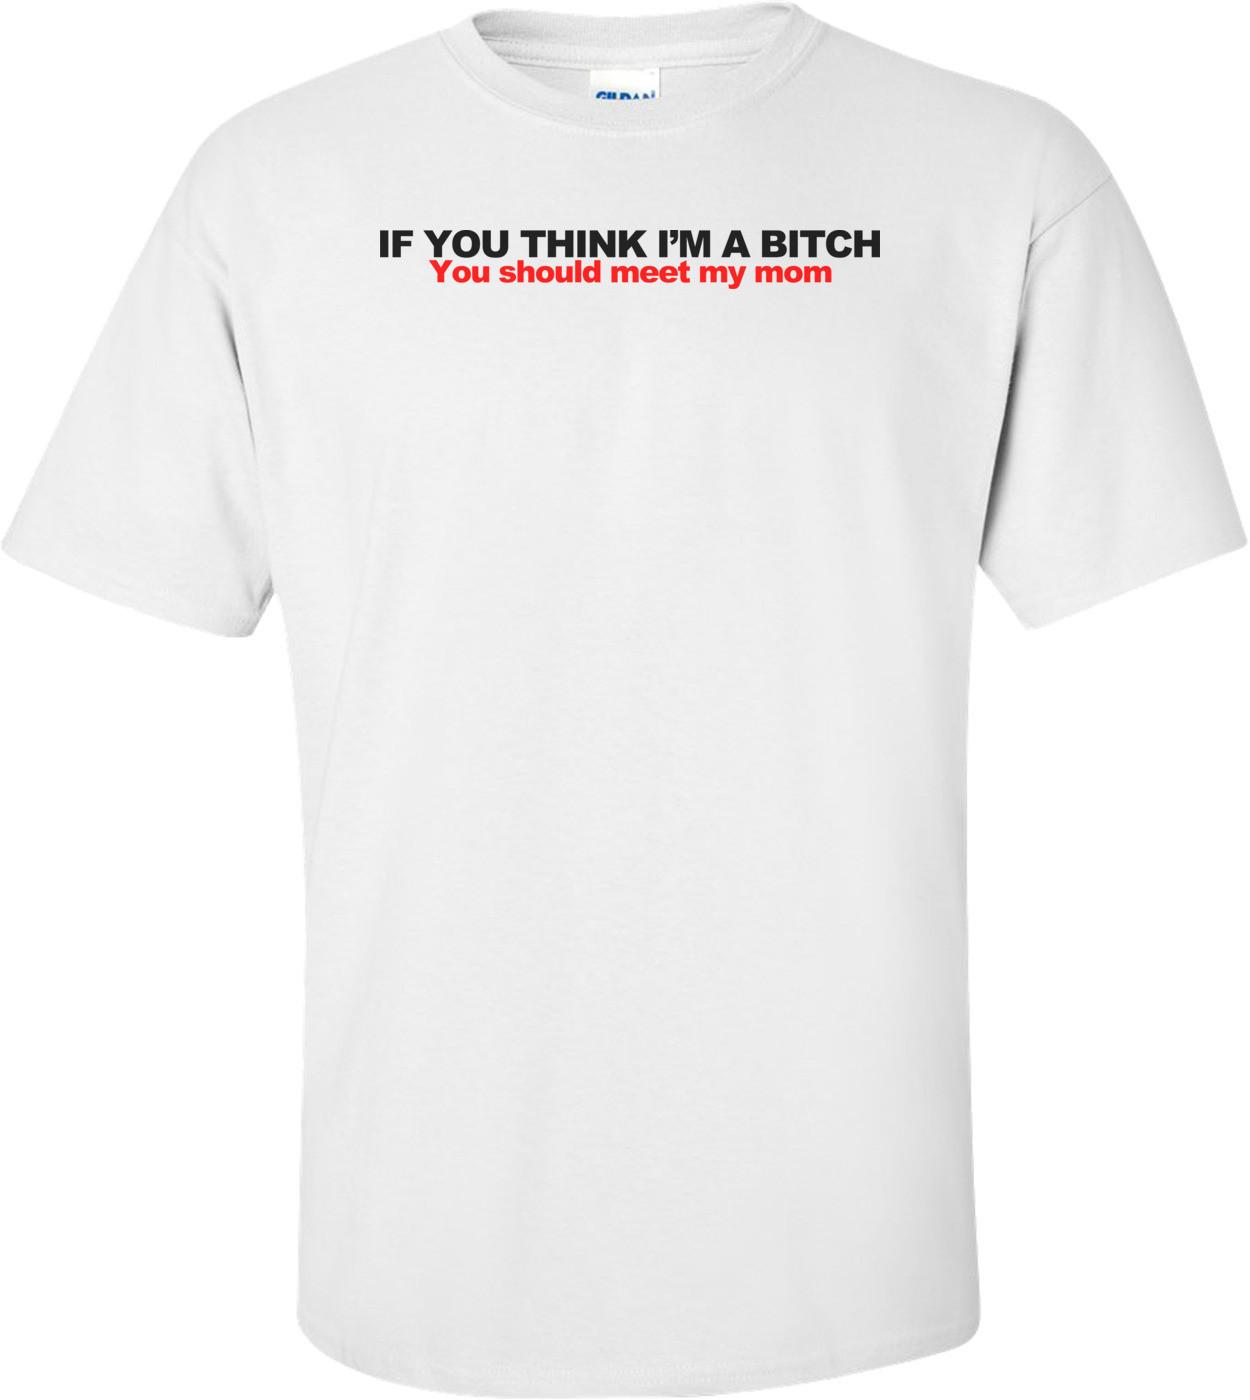 If You Think I'm A Bitch, You Should Meet My Mom Shirt